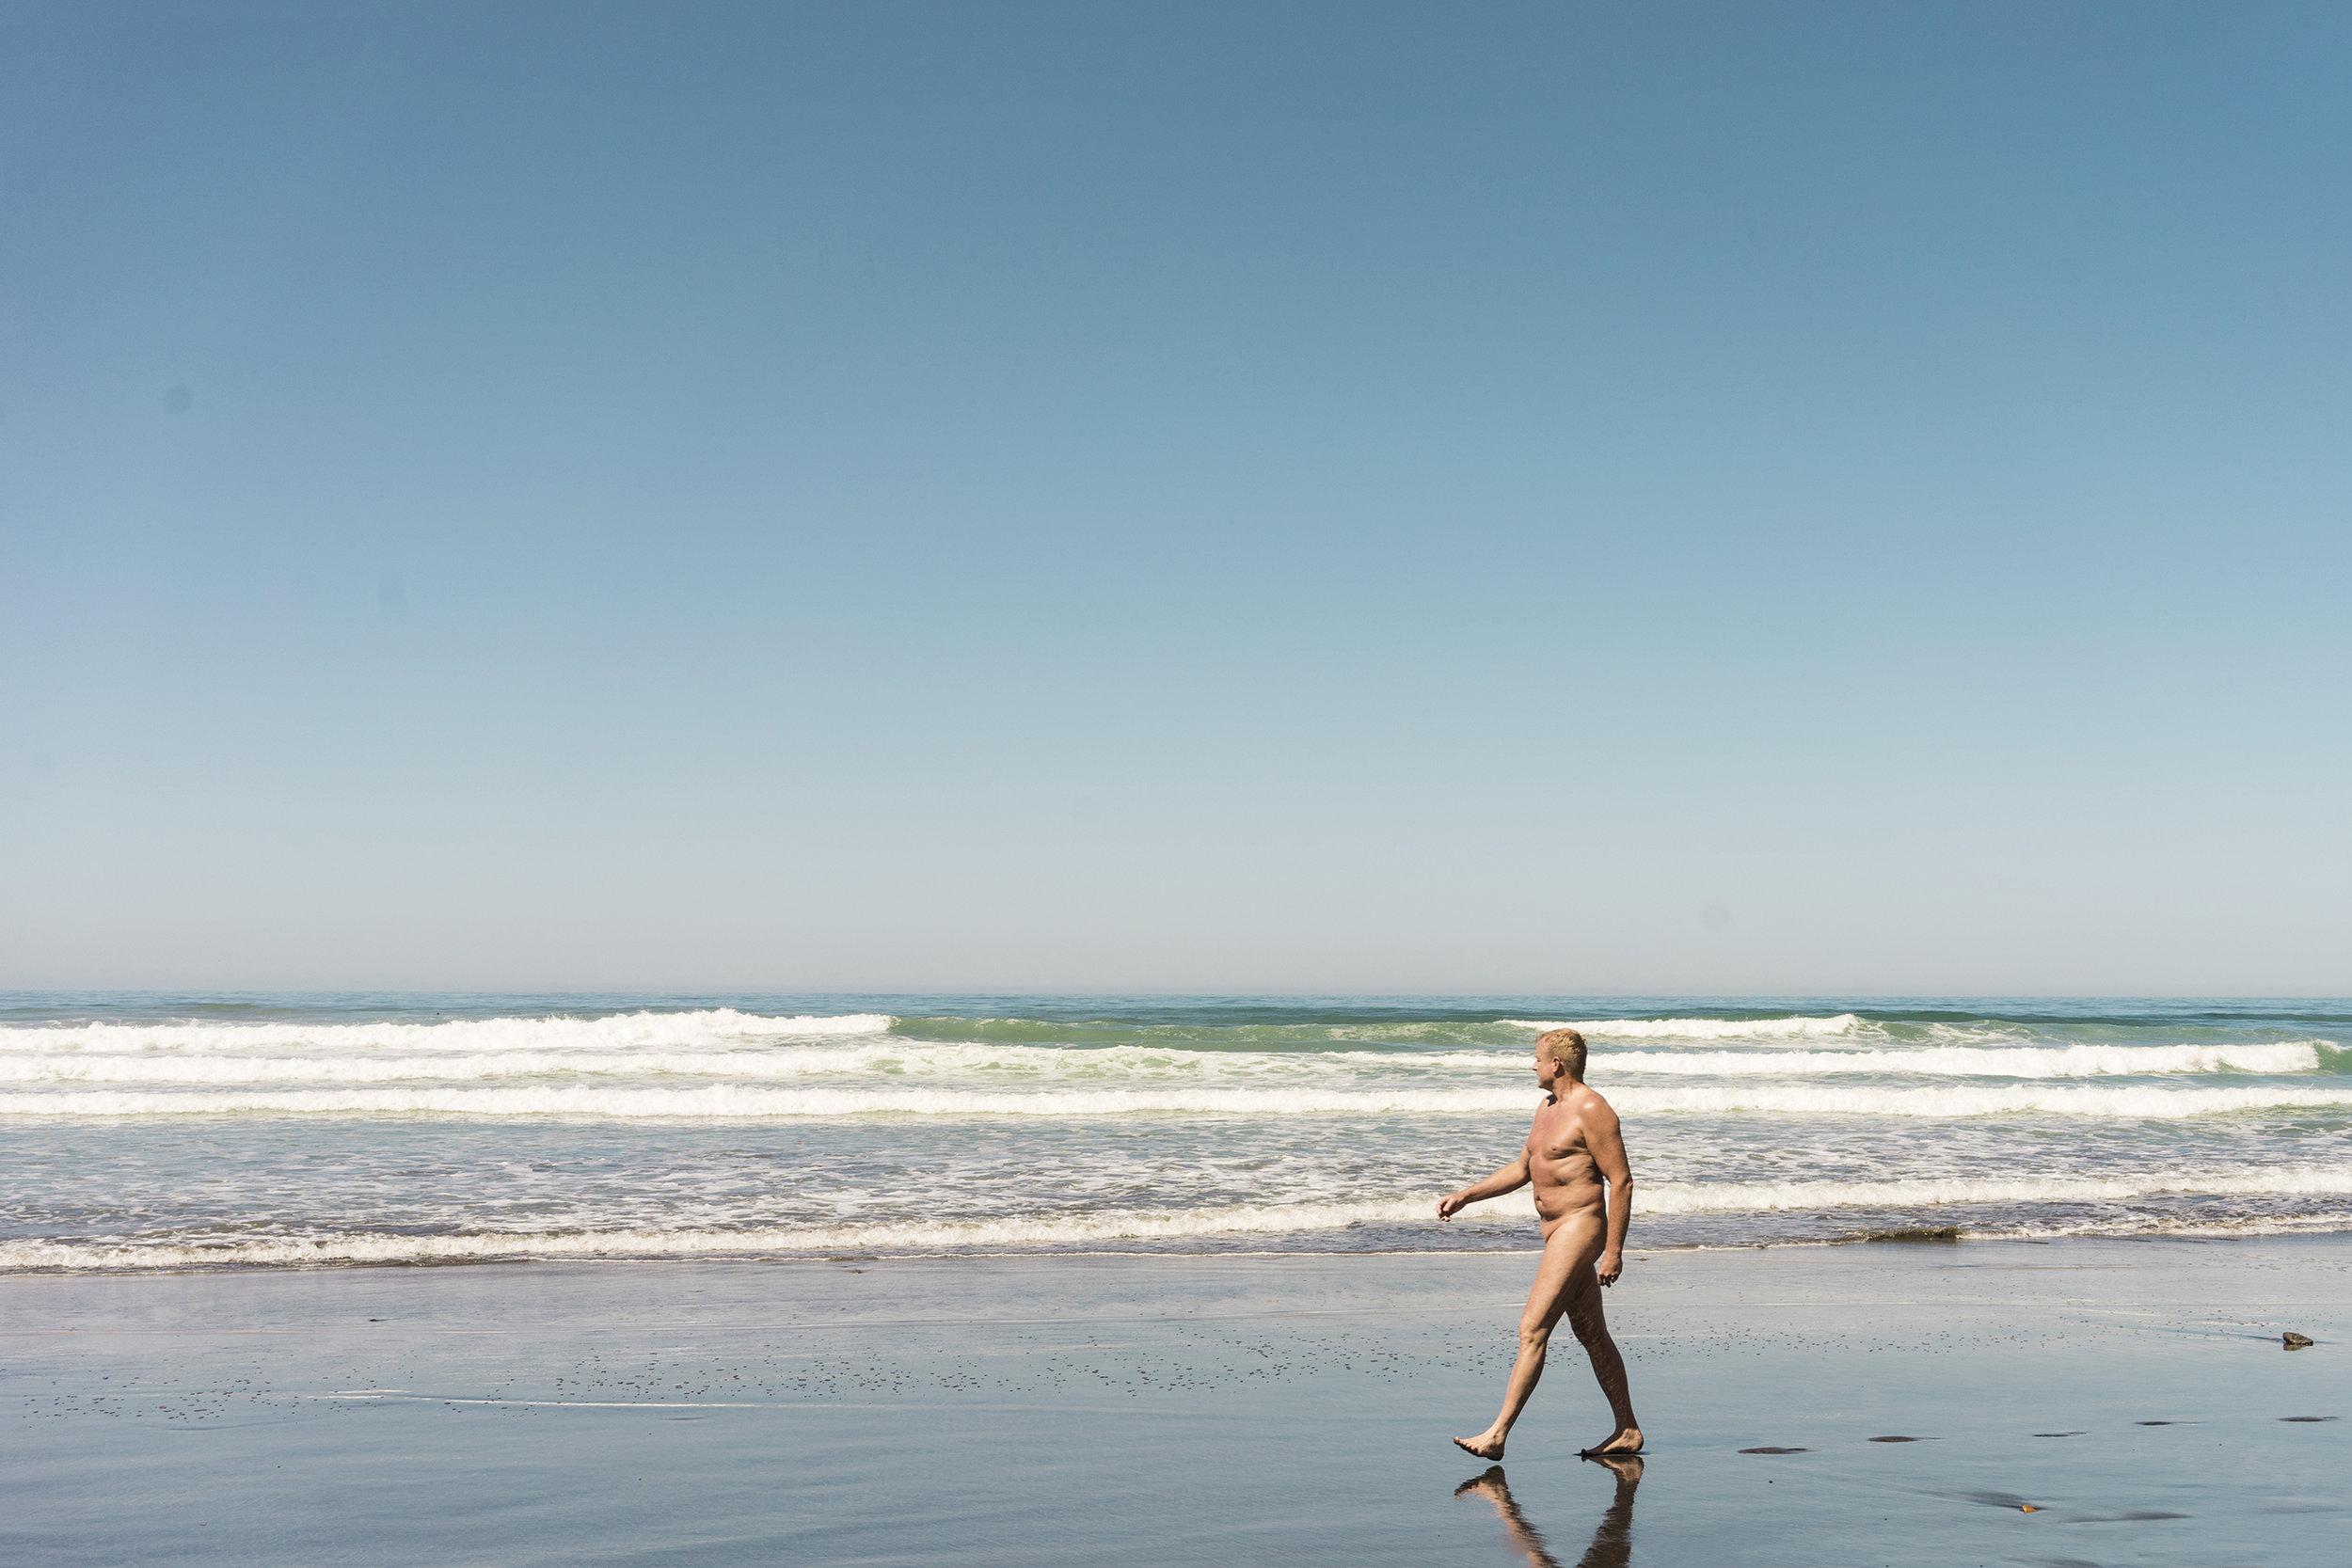 nude_beach_SFW-medium.jpg